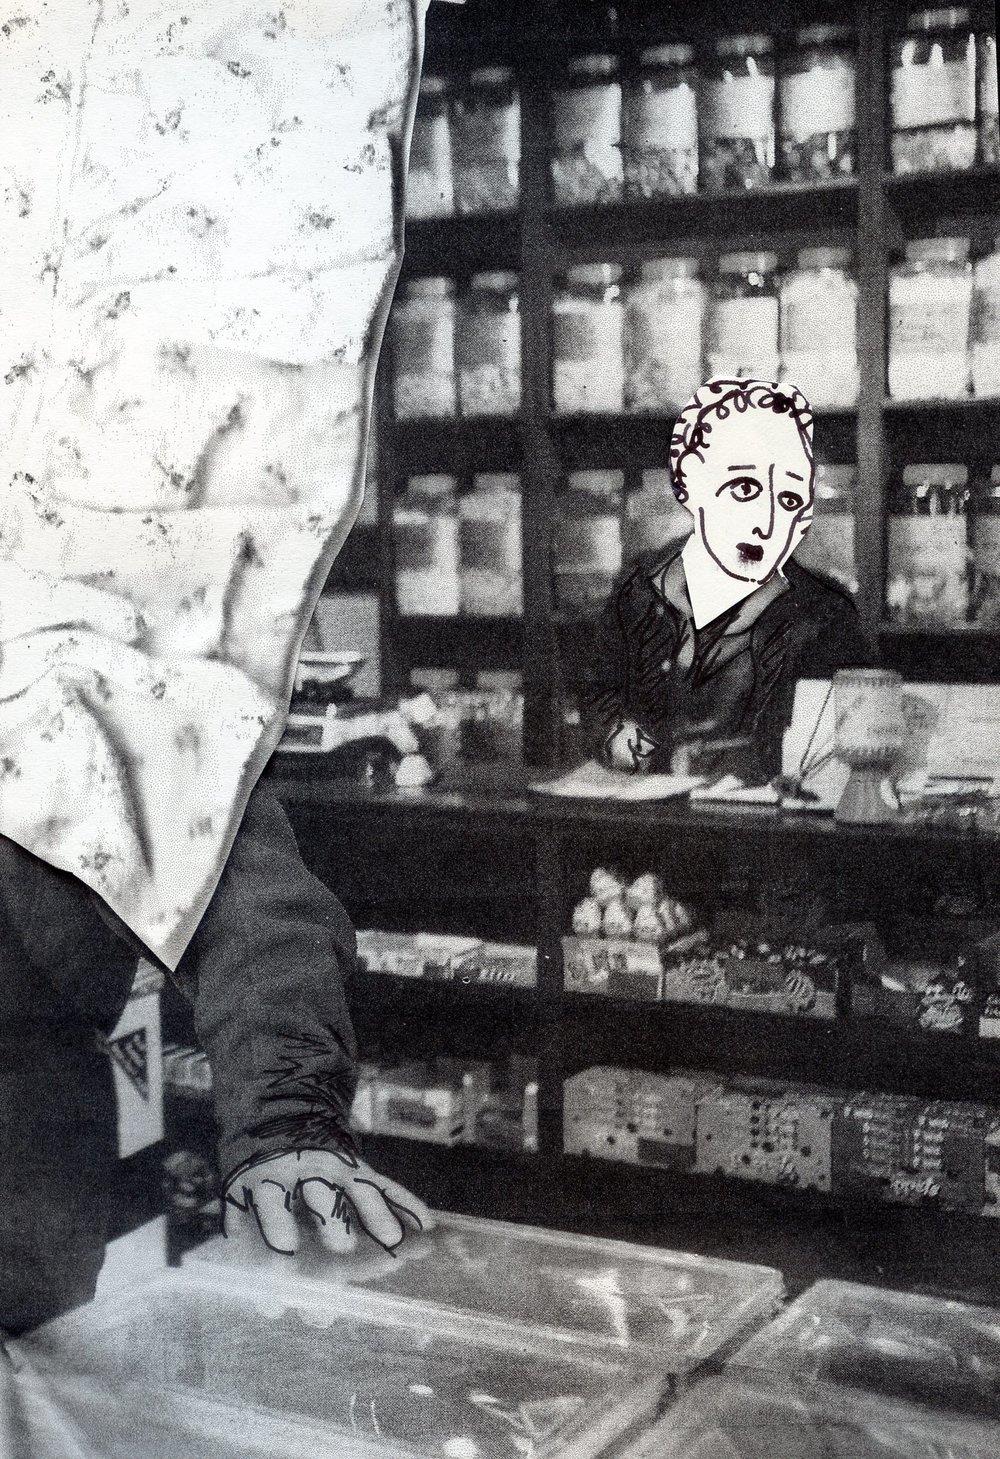 Nostalgic shopkeeper, 2016